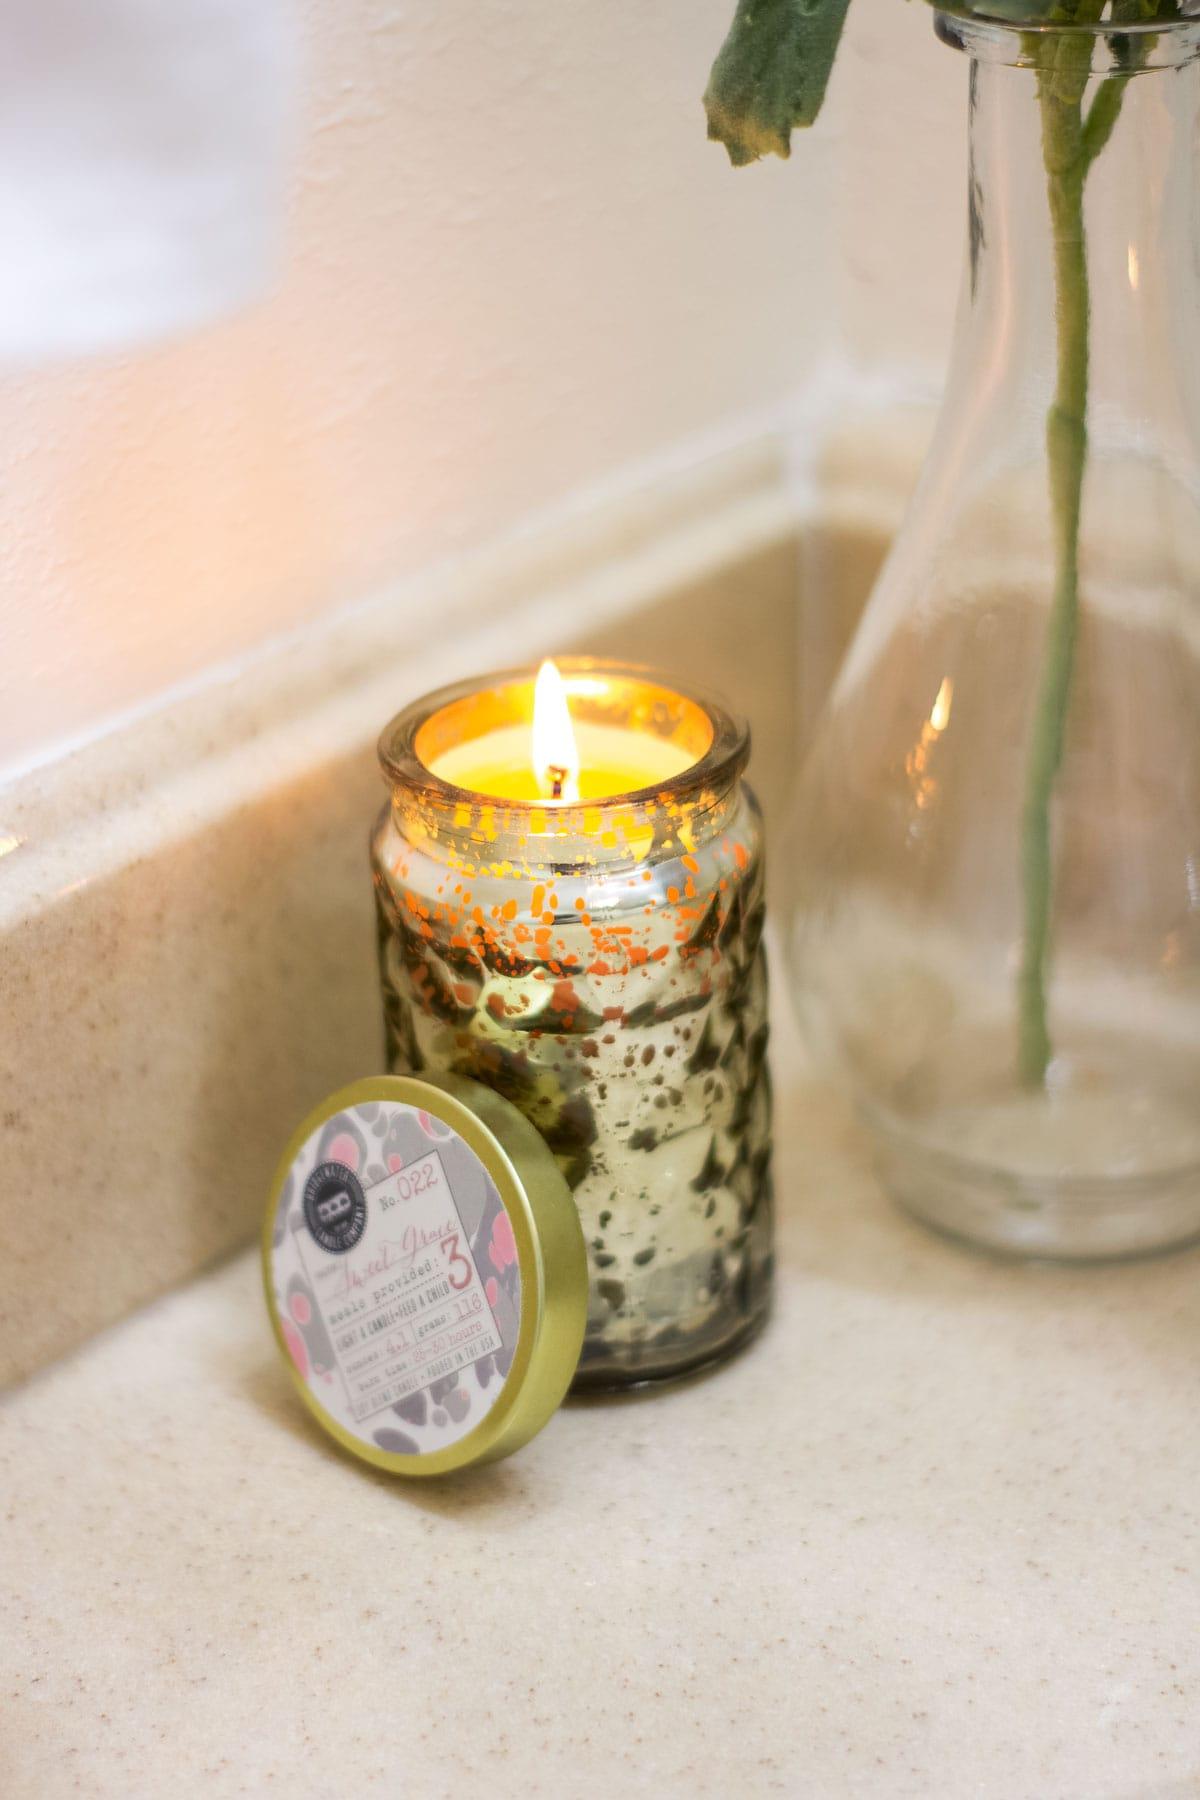 mercury glass candle on bathroom counter